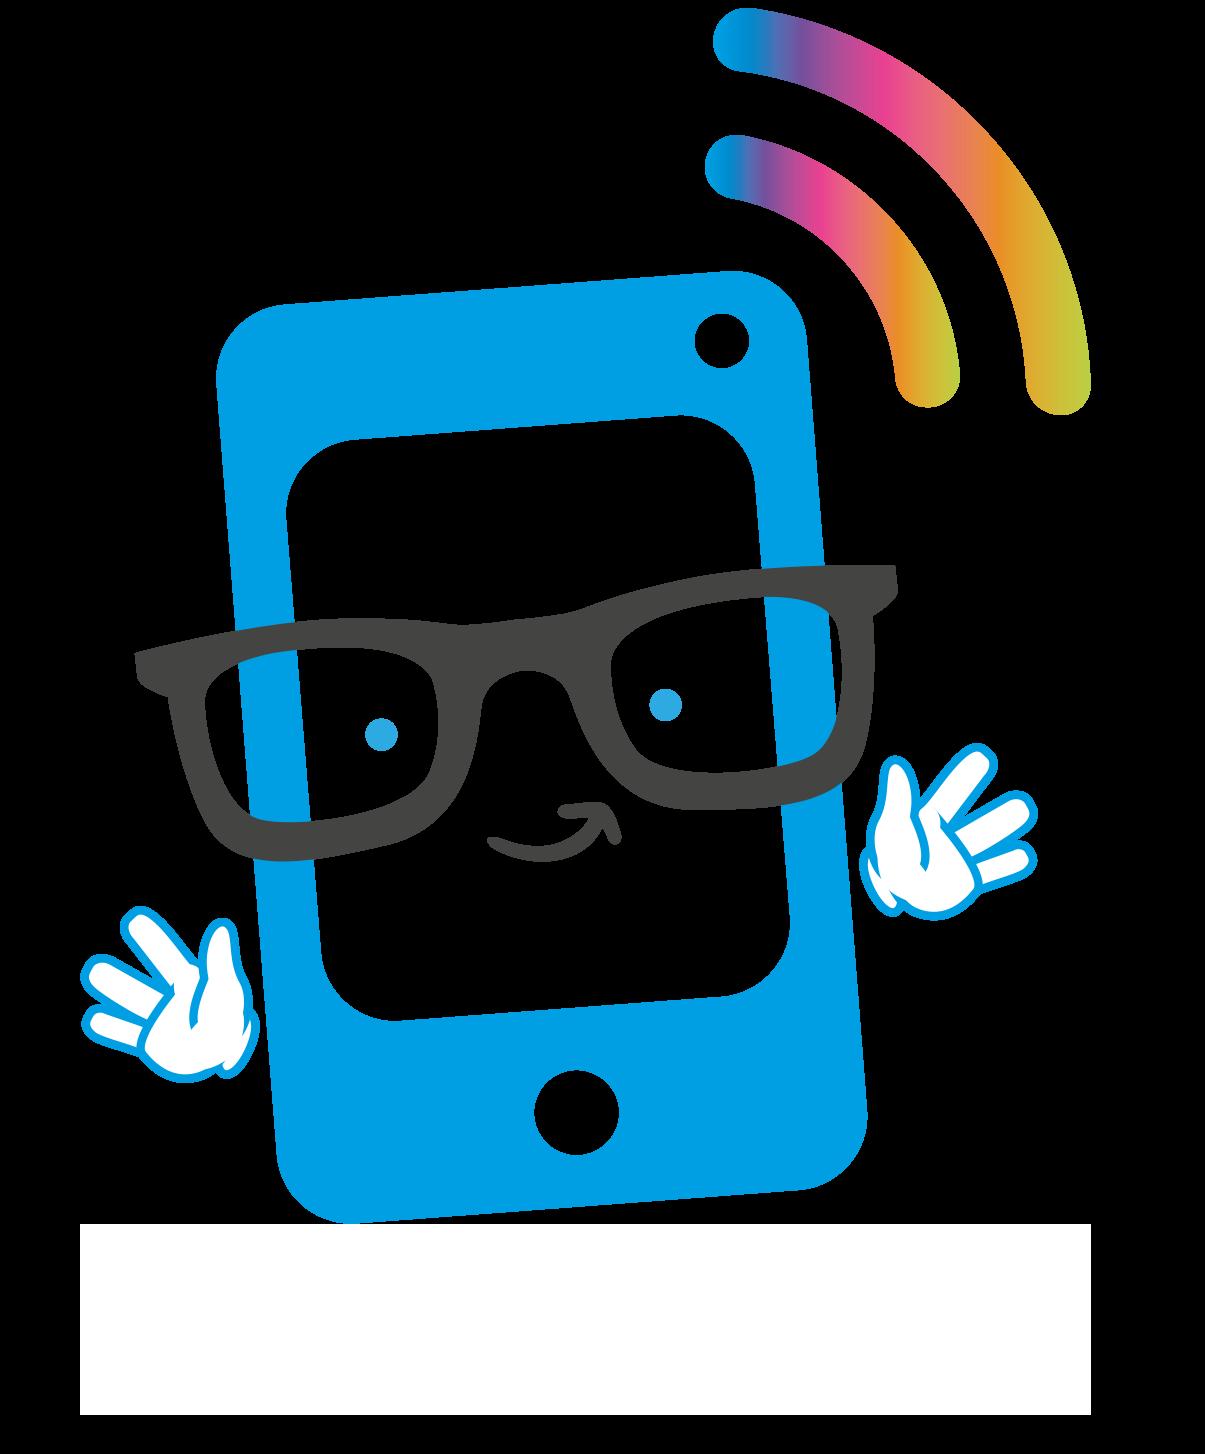 Simple logo - Simple